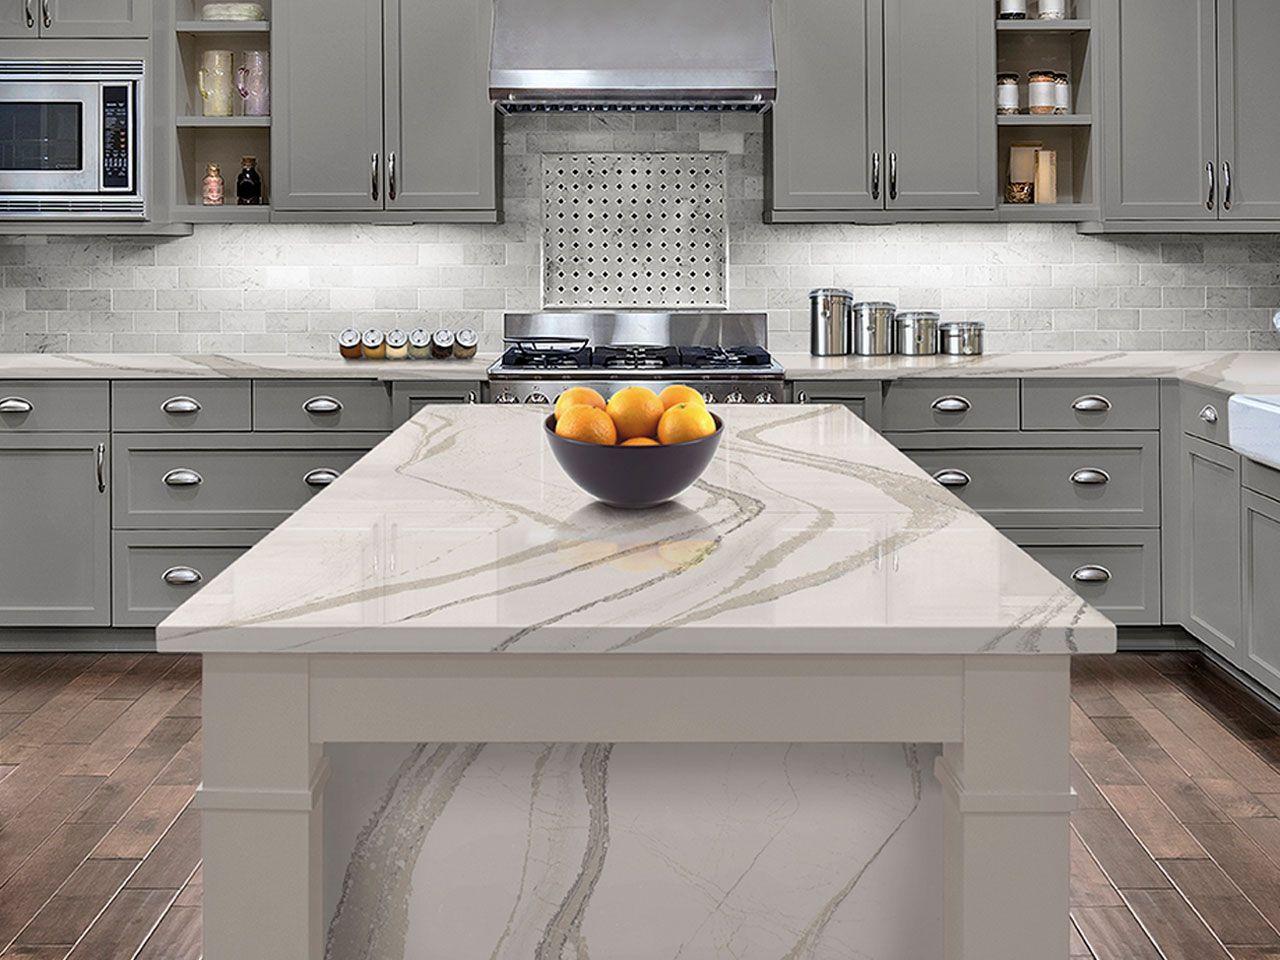 quartz kitchen countertops showrooms sacramento a durable easy care alternative